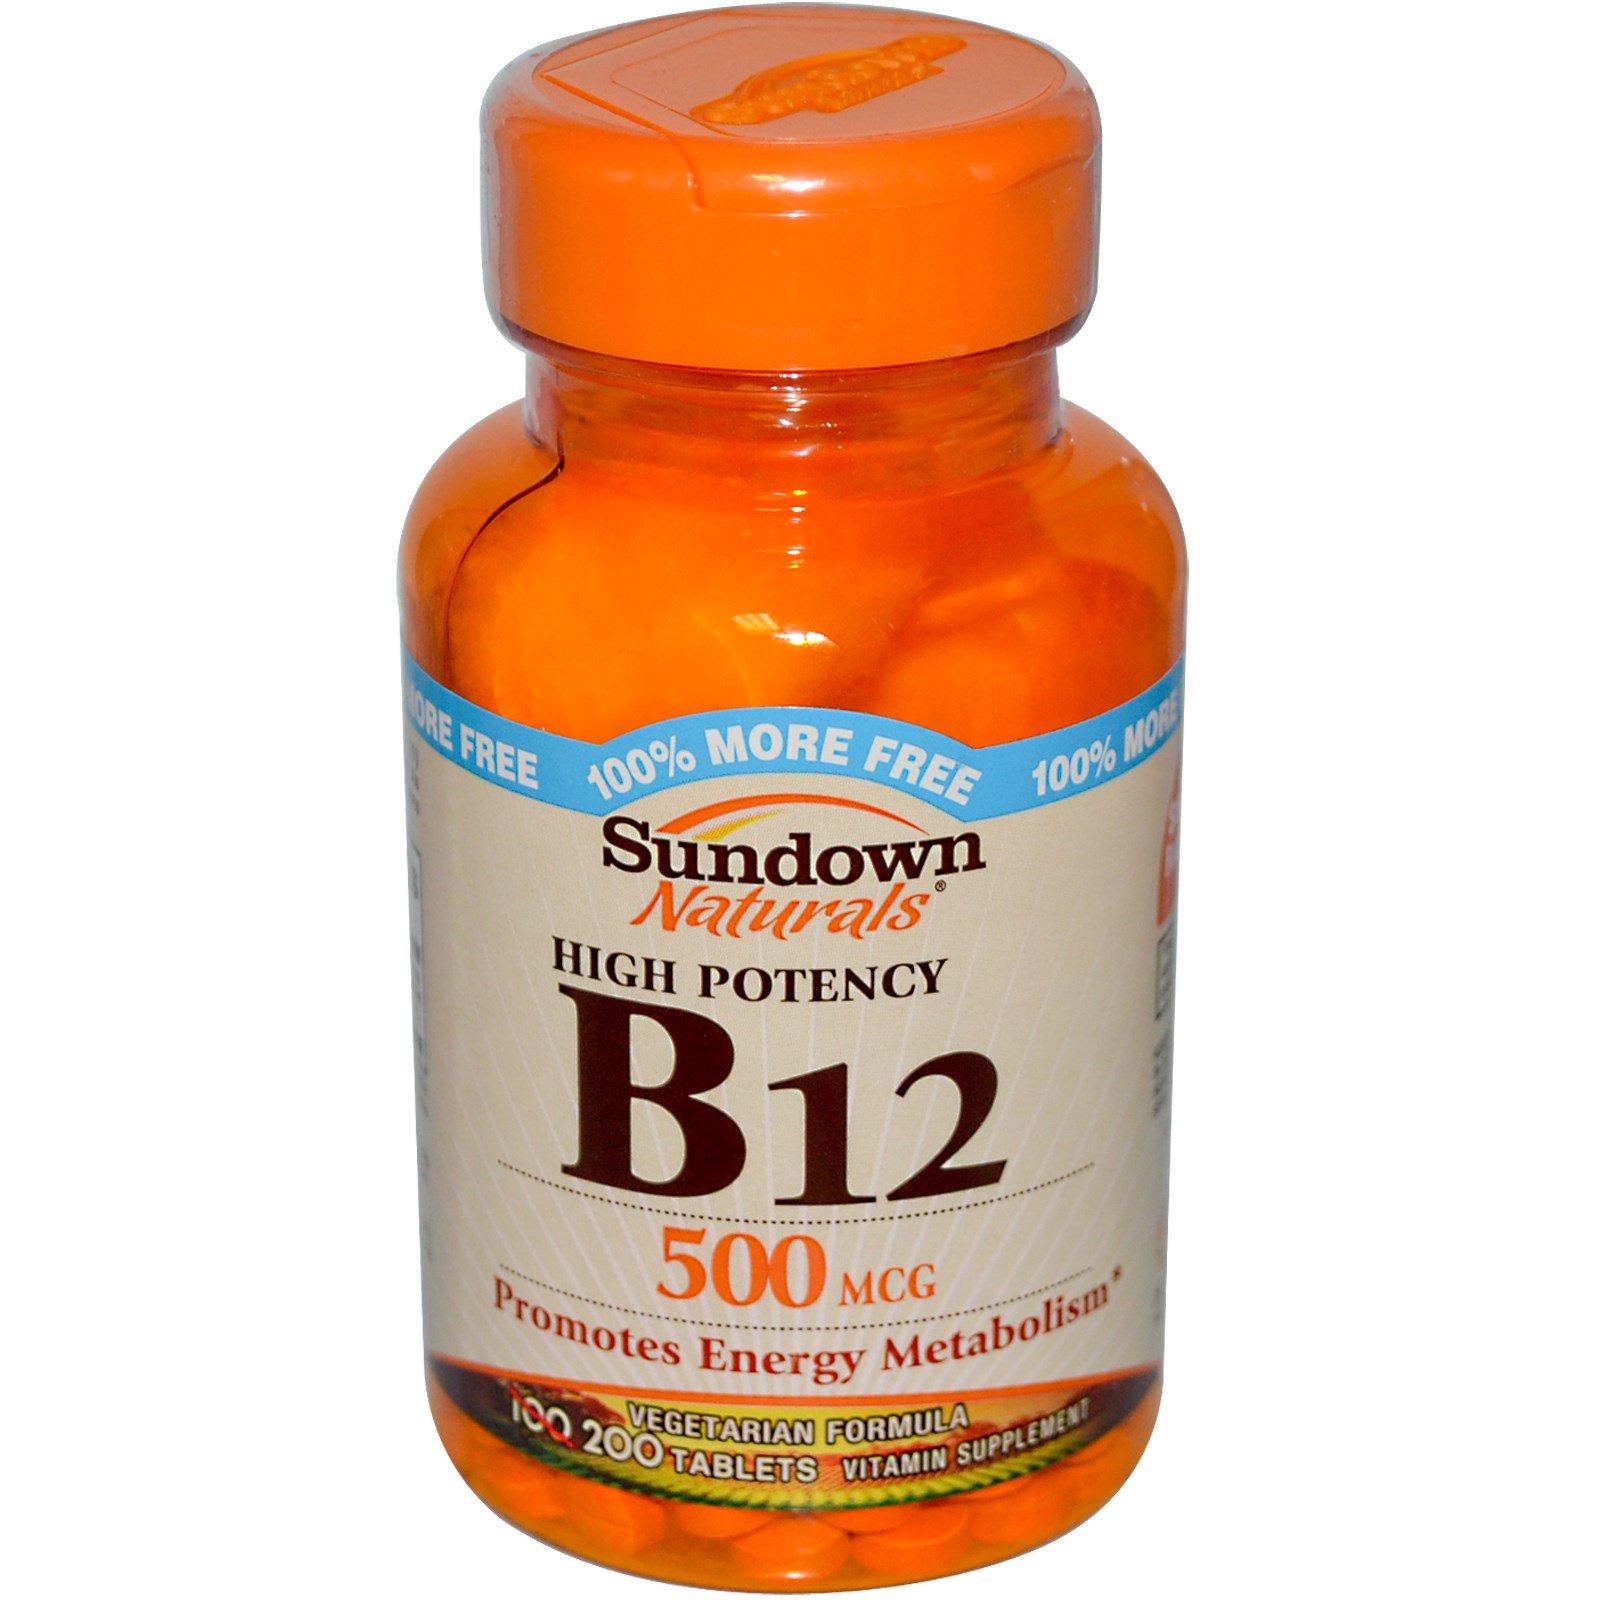 Sundown Naturals, B-12, высокоактивный, 500 мкг, 200 таблеток